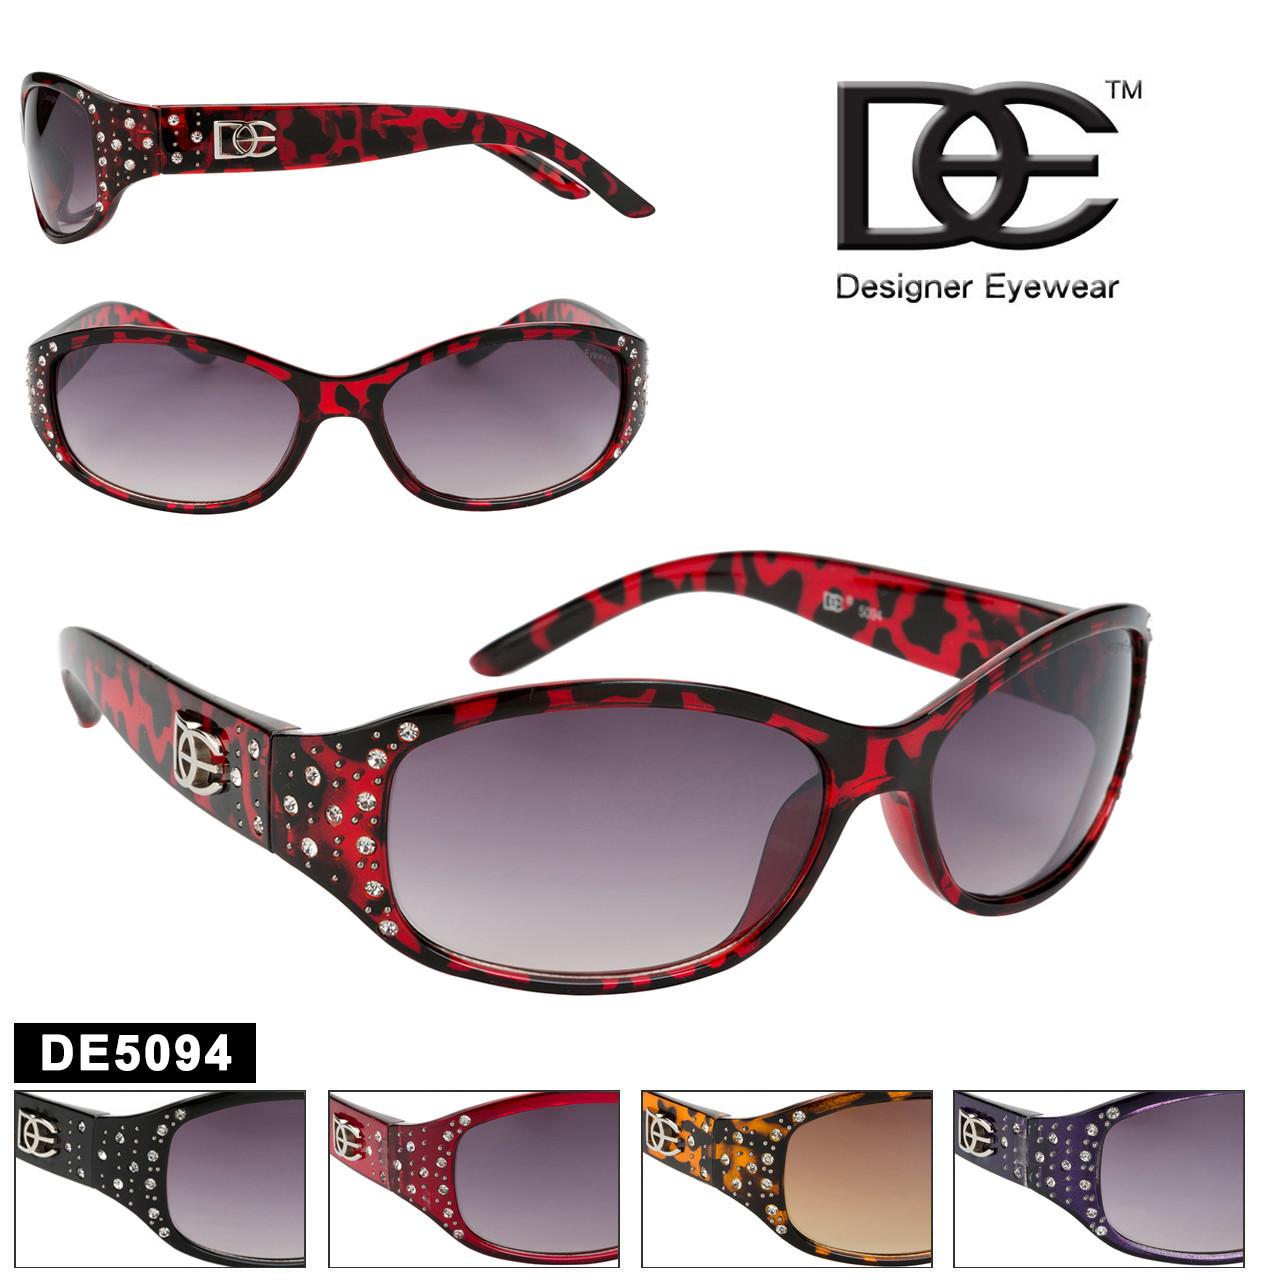 DE™ Rhinestone Sunglasses - Style #DE5094